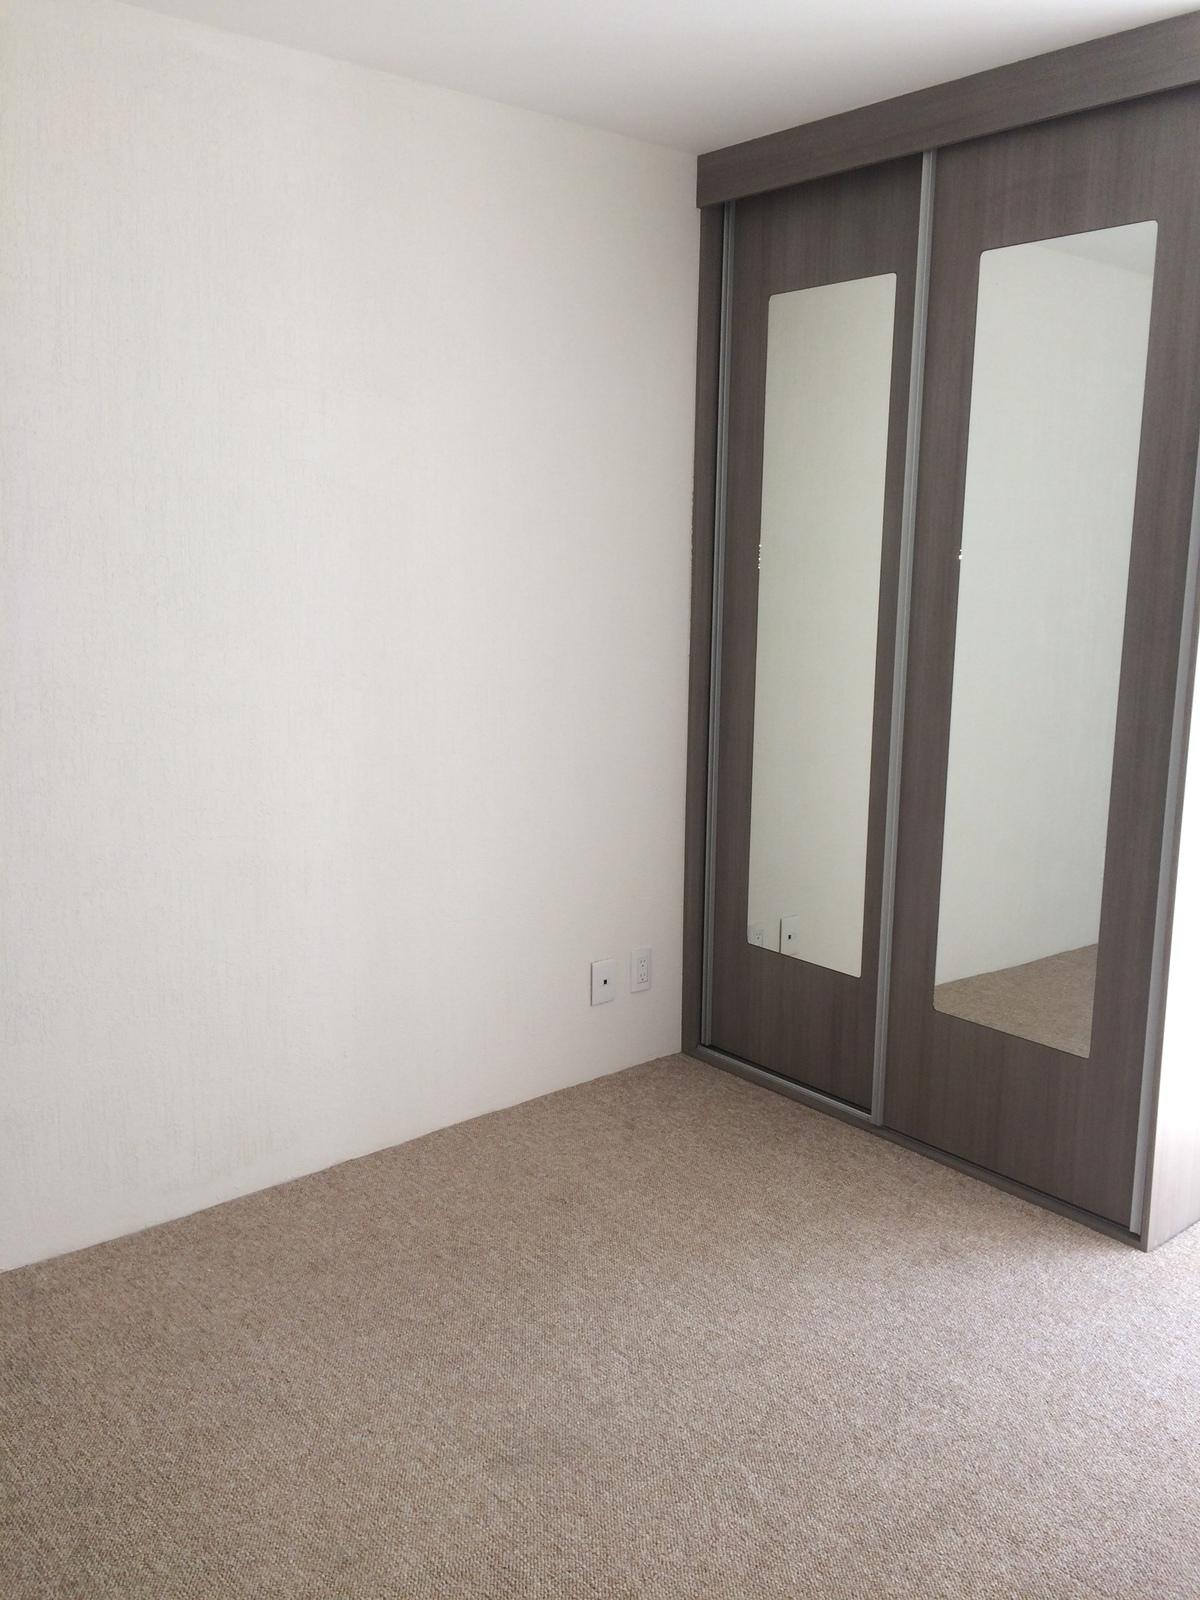 15 de 22: Recámara 1 con closet